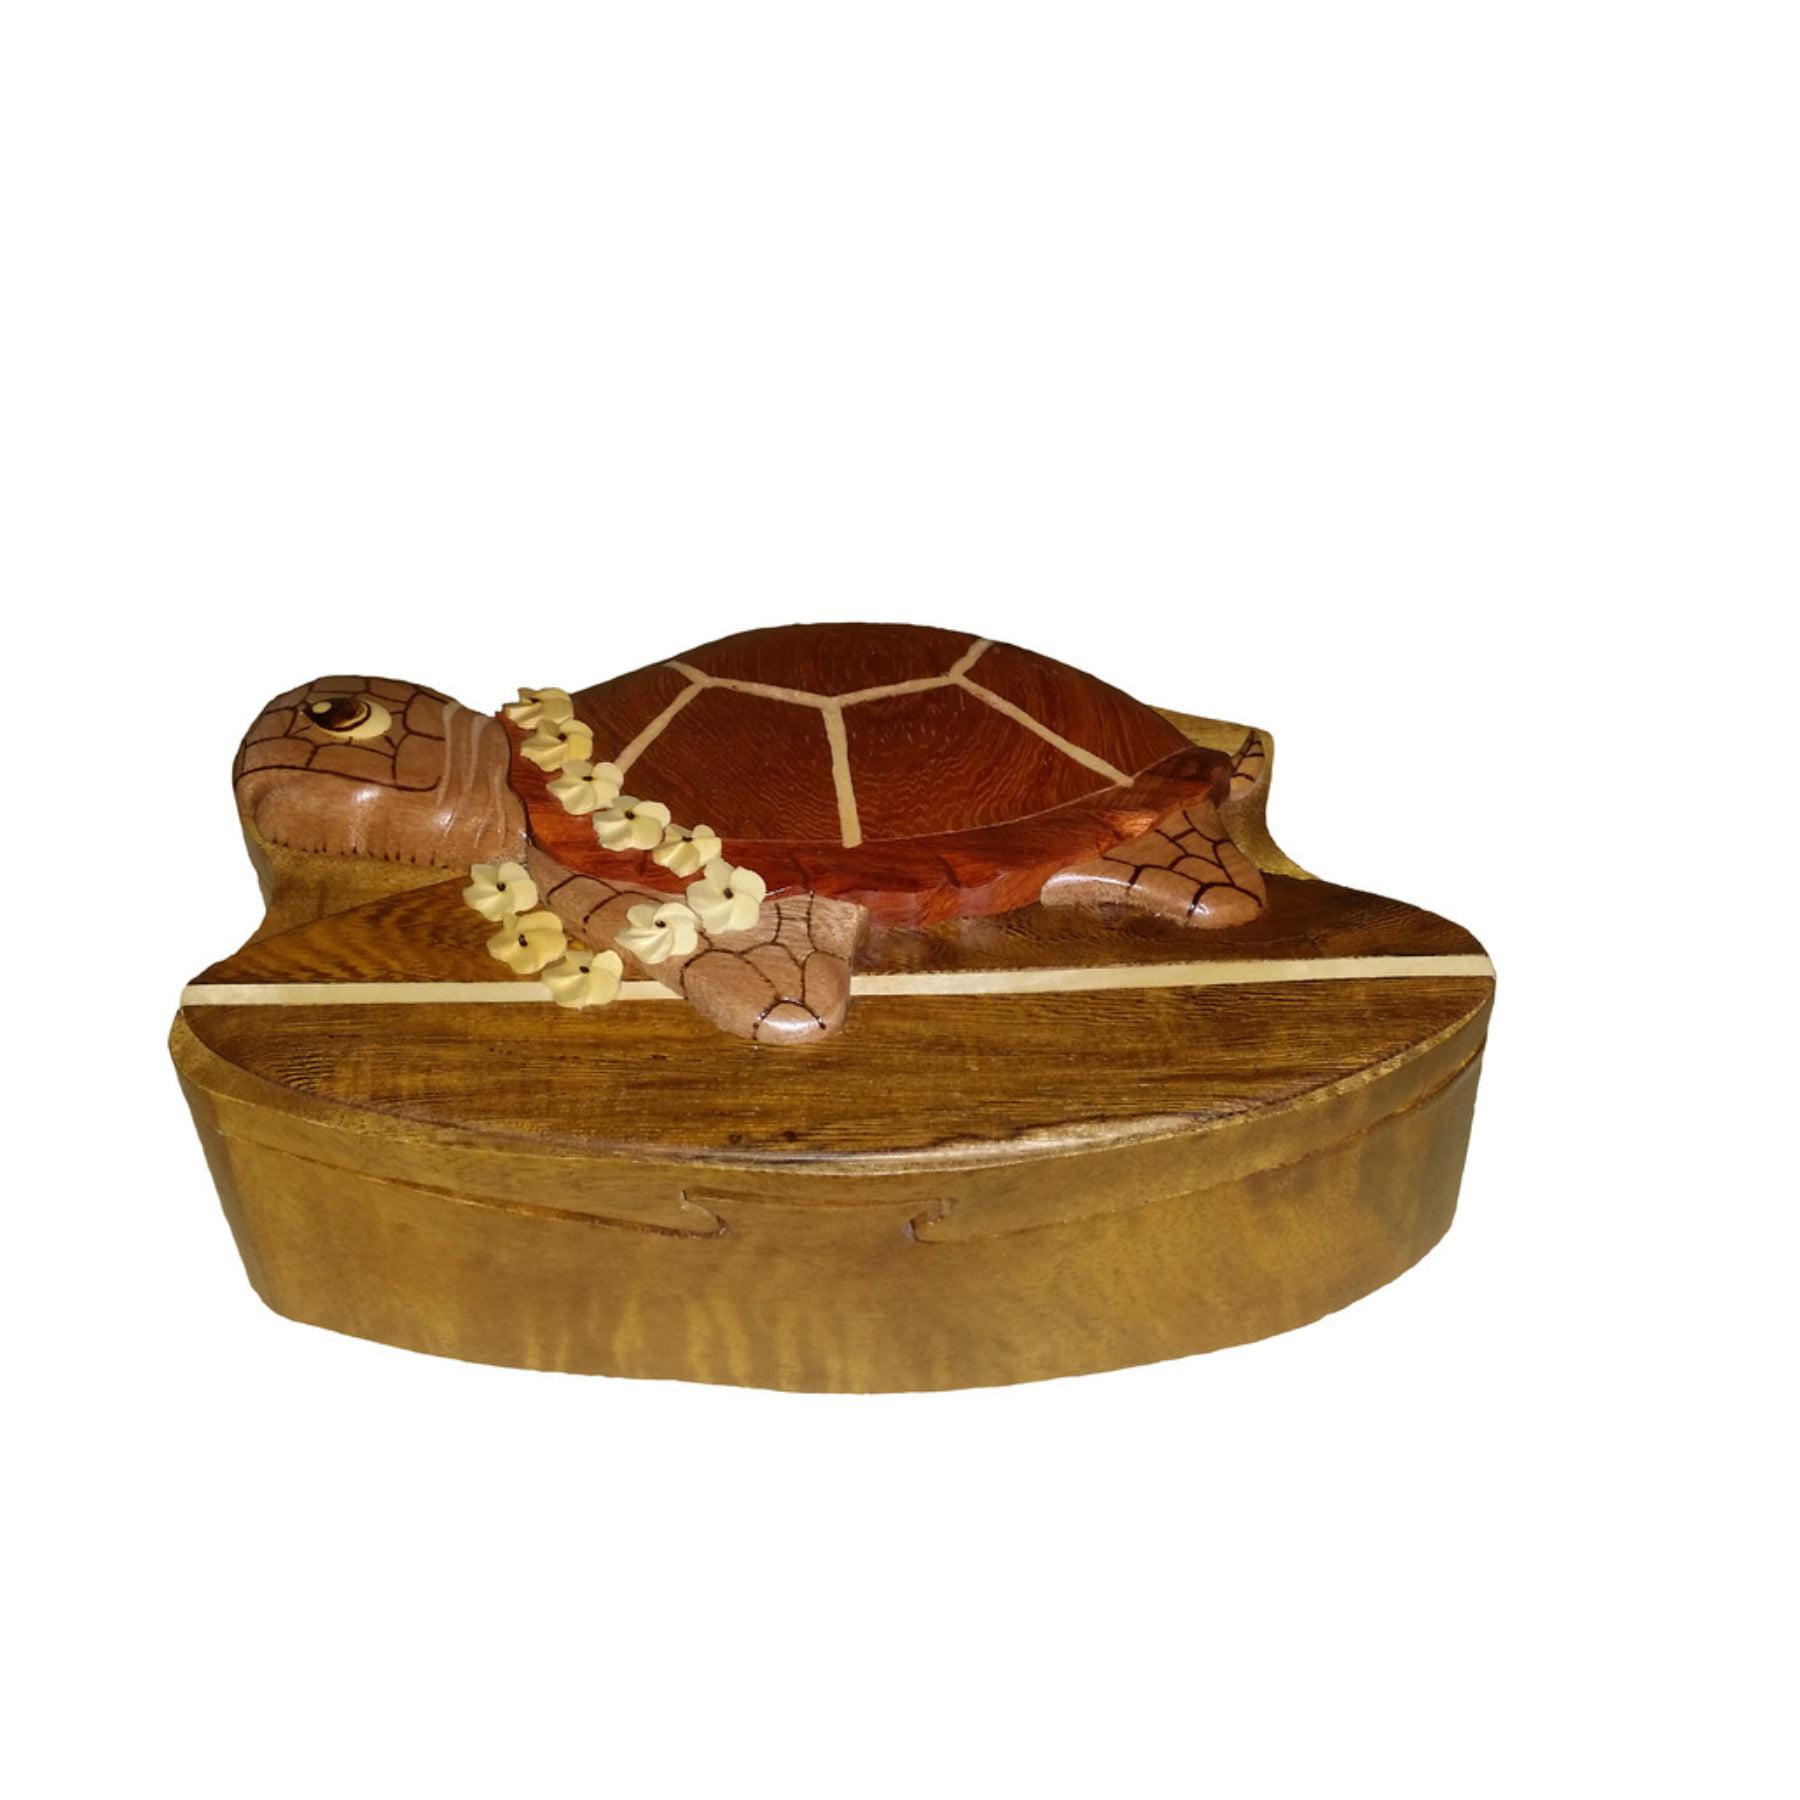 Hawaii Style Wood Keepsake Jewelry Puzzle Box Surfing Tur...